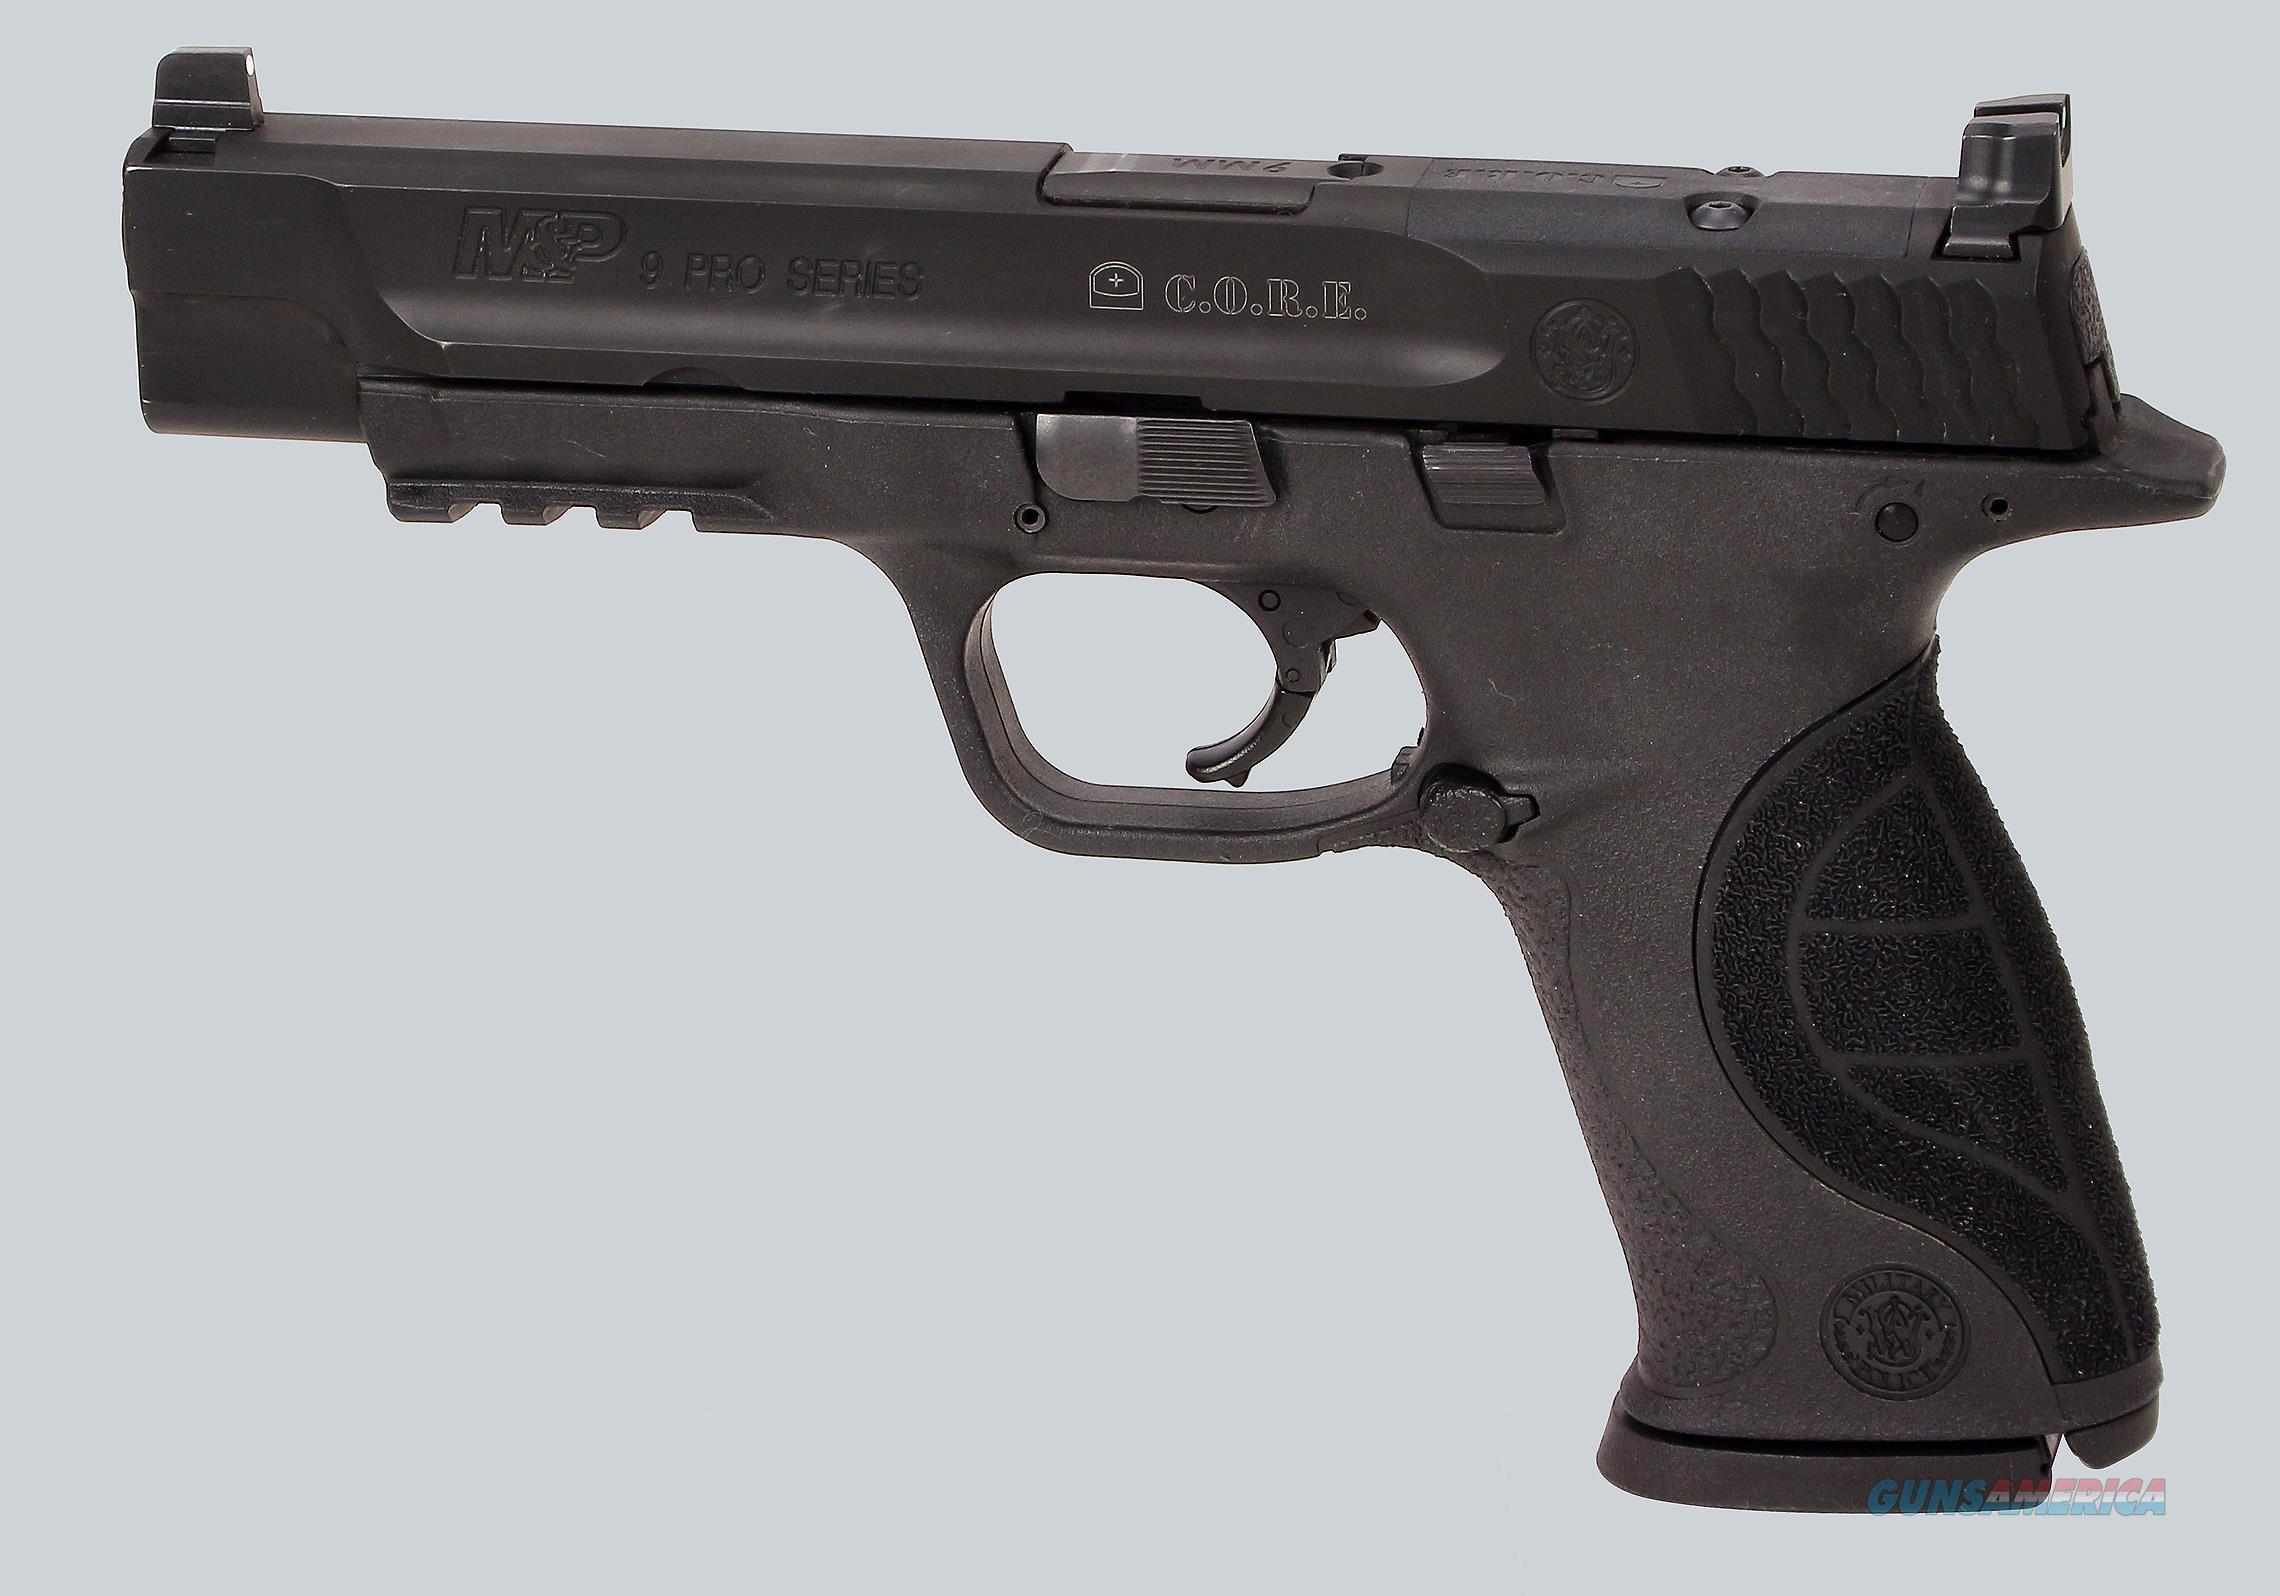 Smith & Wesson 9mm M&P Pro Series Pistol  Guns > Pistols > Smith & Wesson Pistols - Autos > Polymer Frame